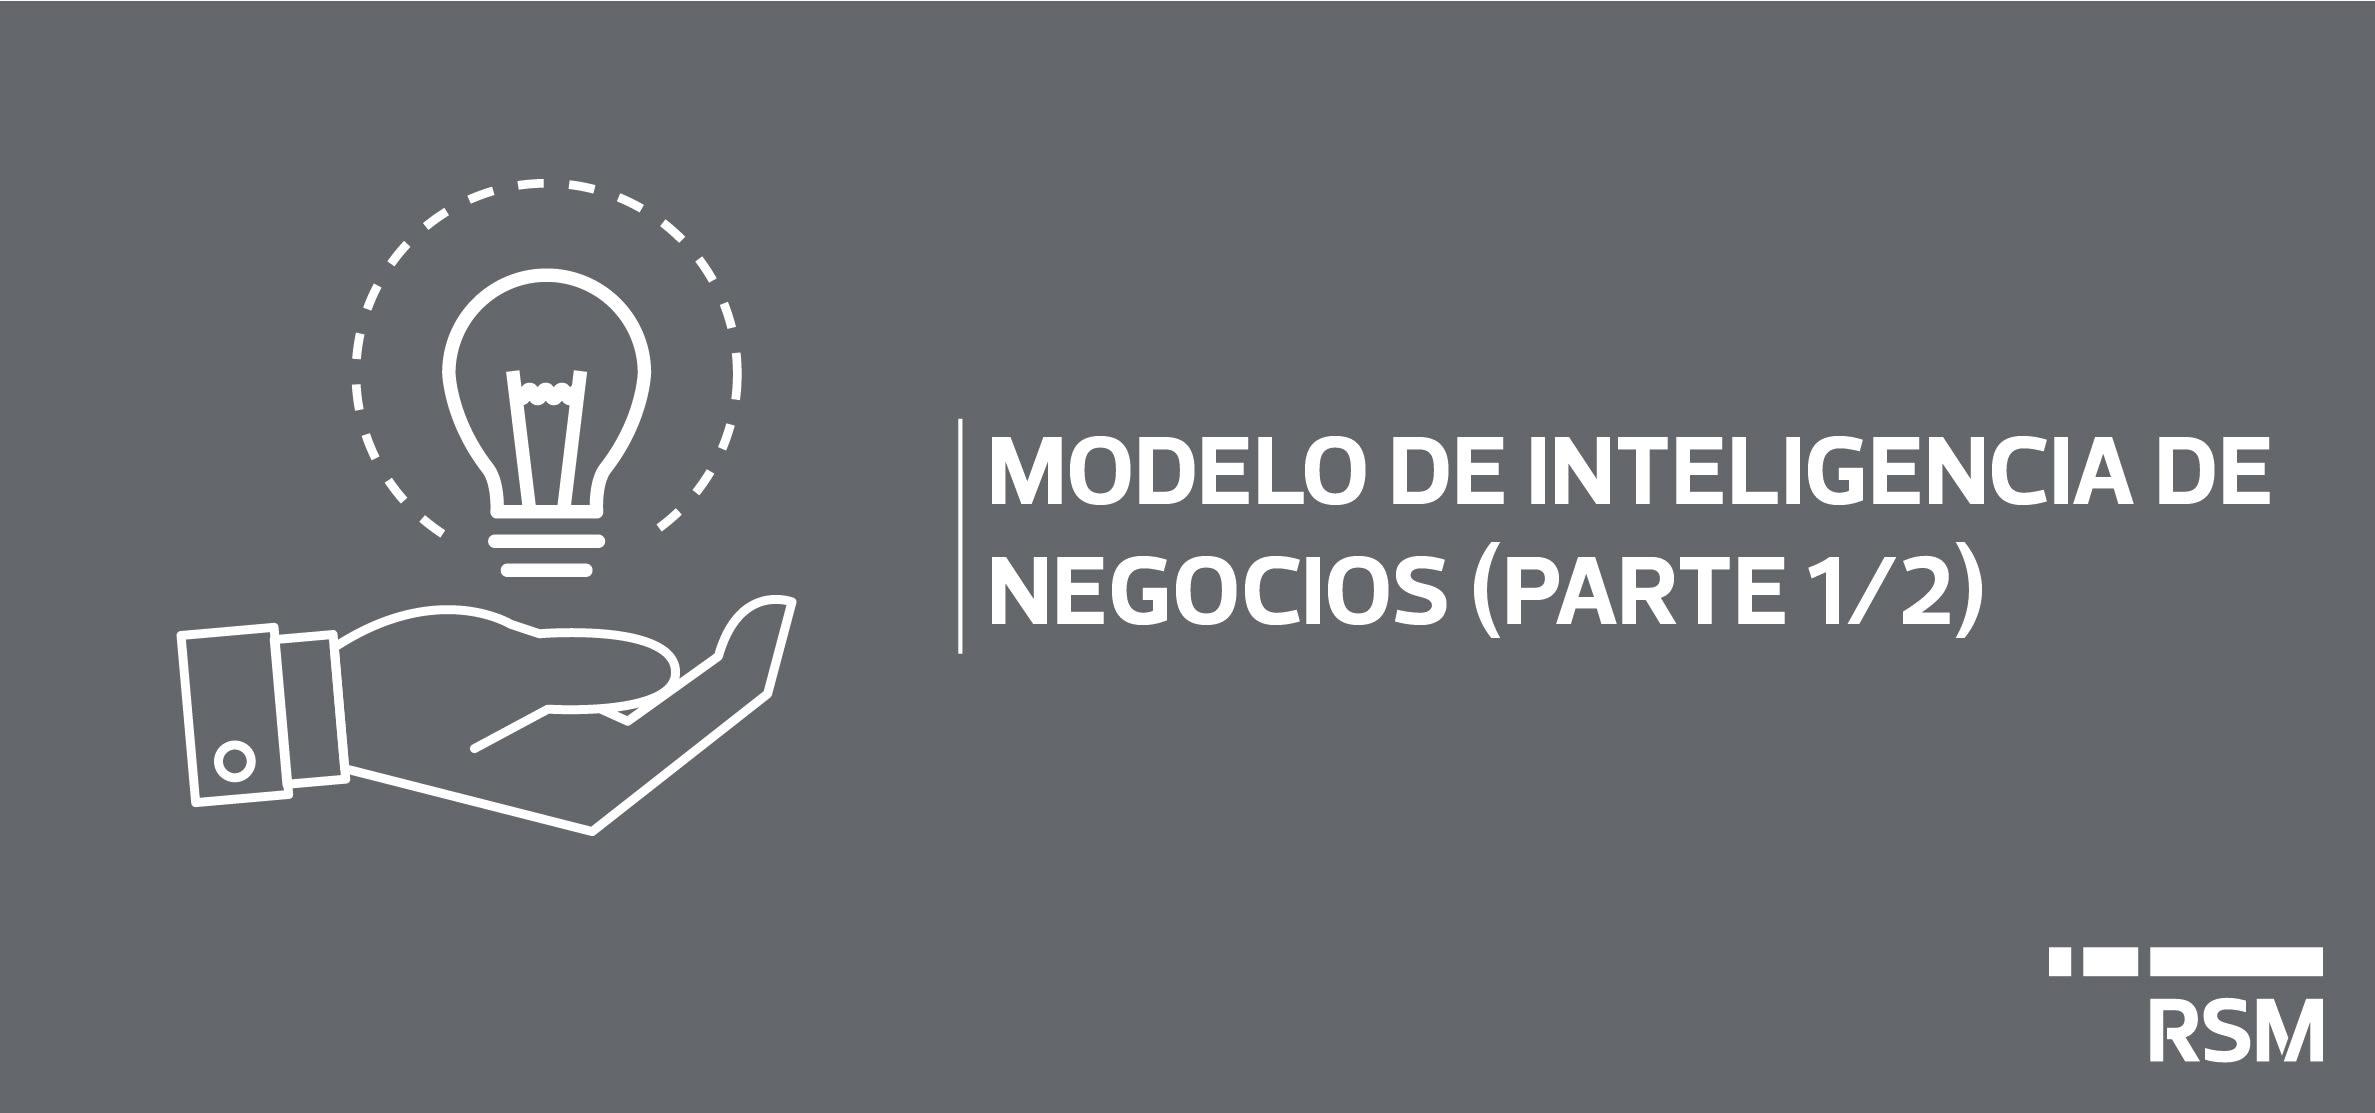 public://media/Lineas_negocio/consultoria/Insights/IMG/miniaturas_pagina_web_blogs-13.jpg